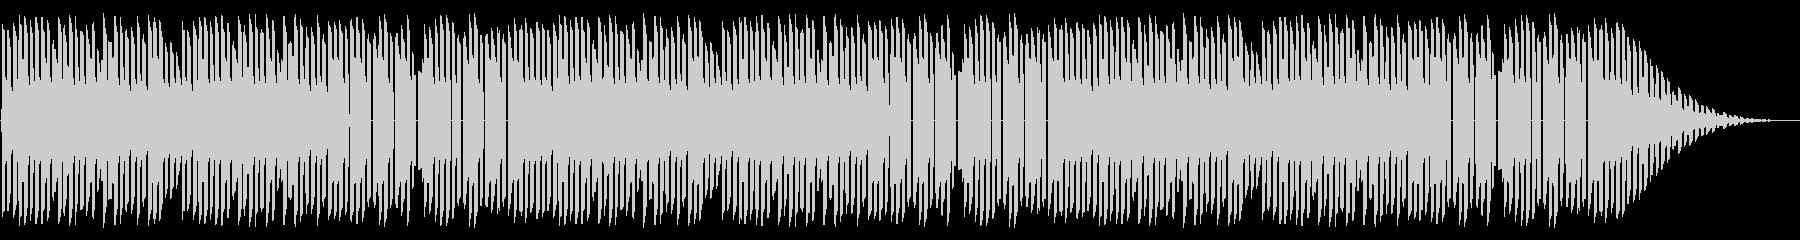 NES STG B01-1(タイトル) の未再生の波形